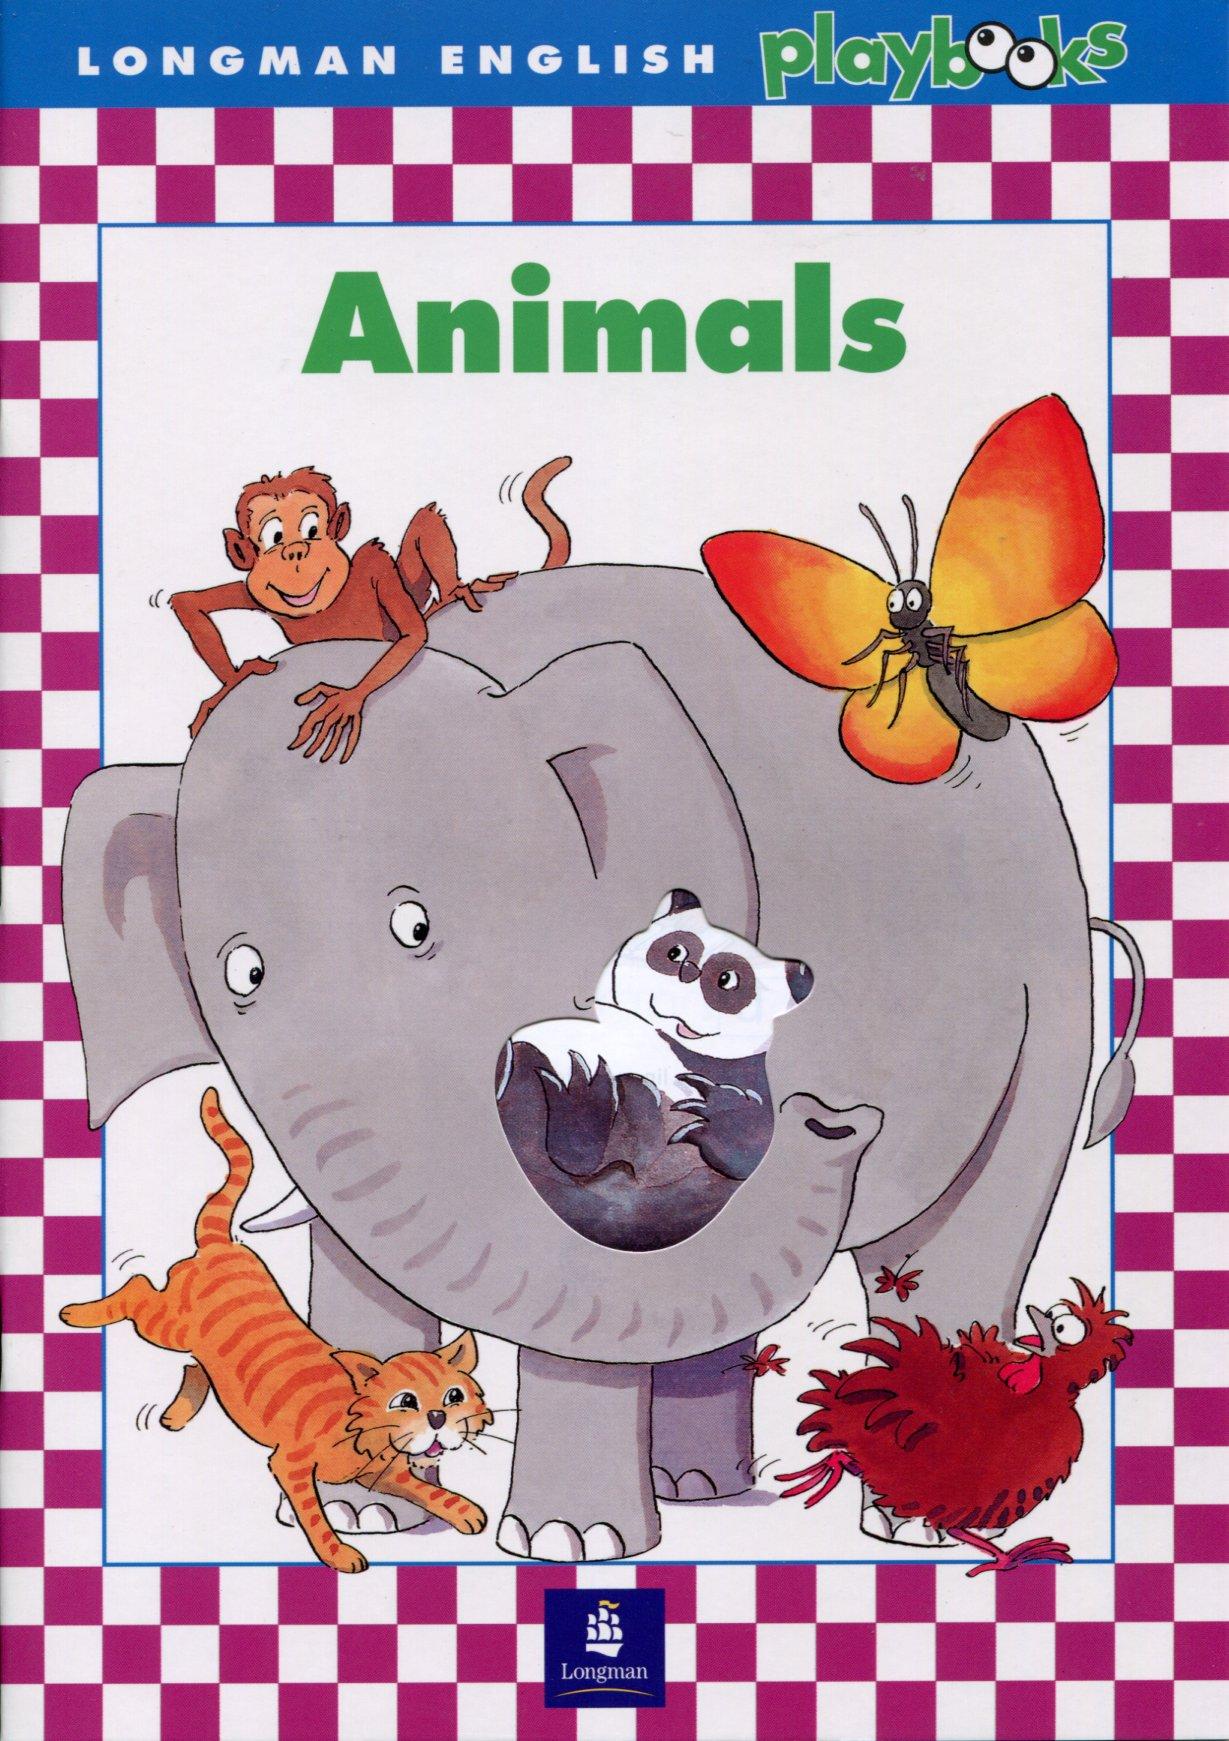 Longman English Playbooks: Animals